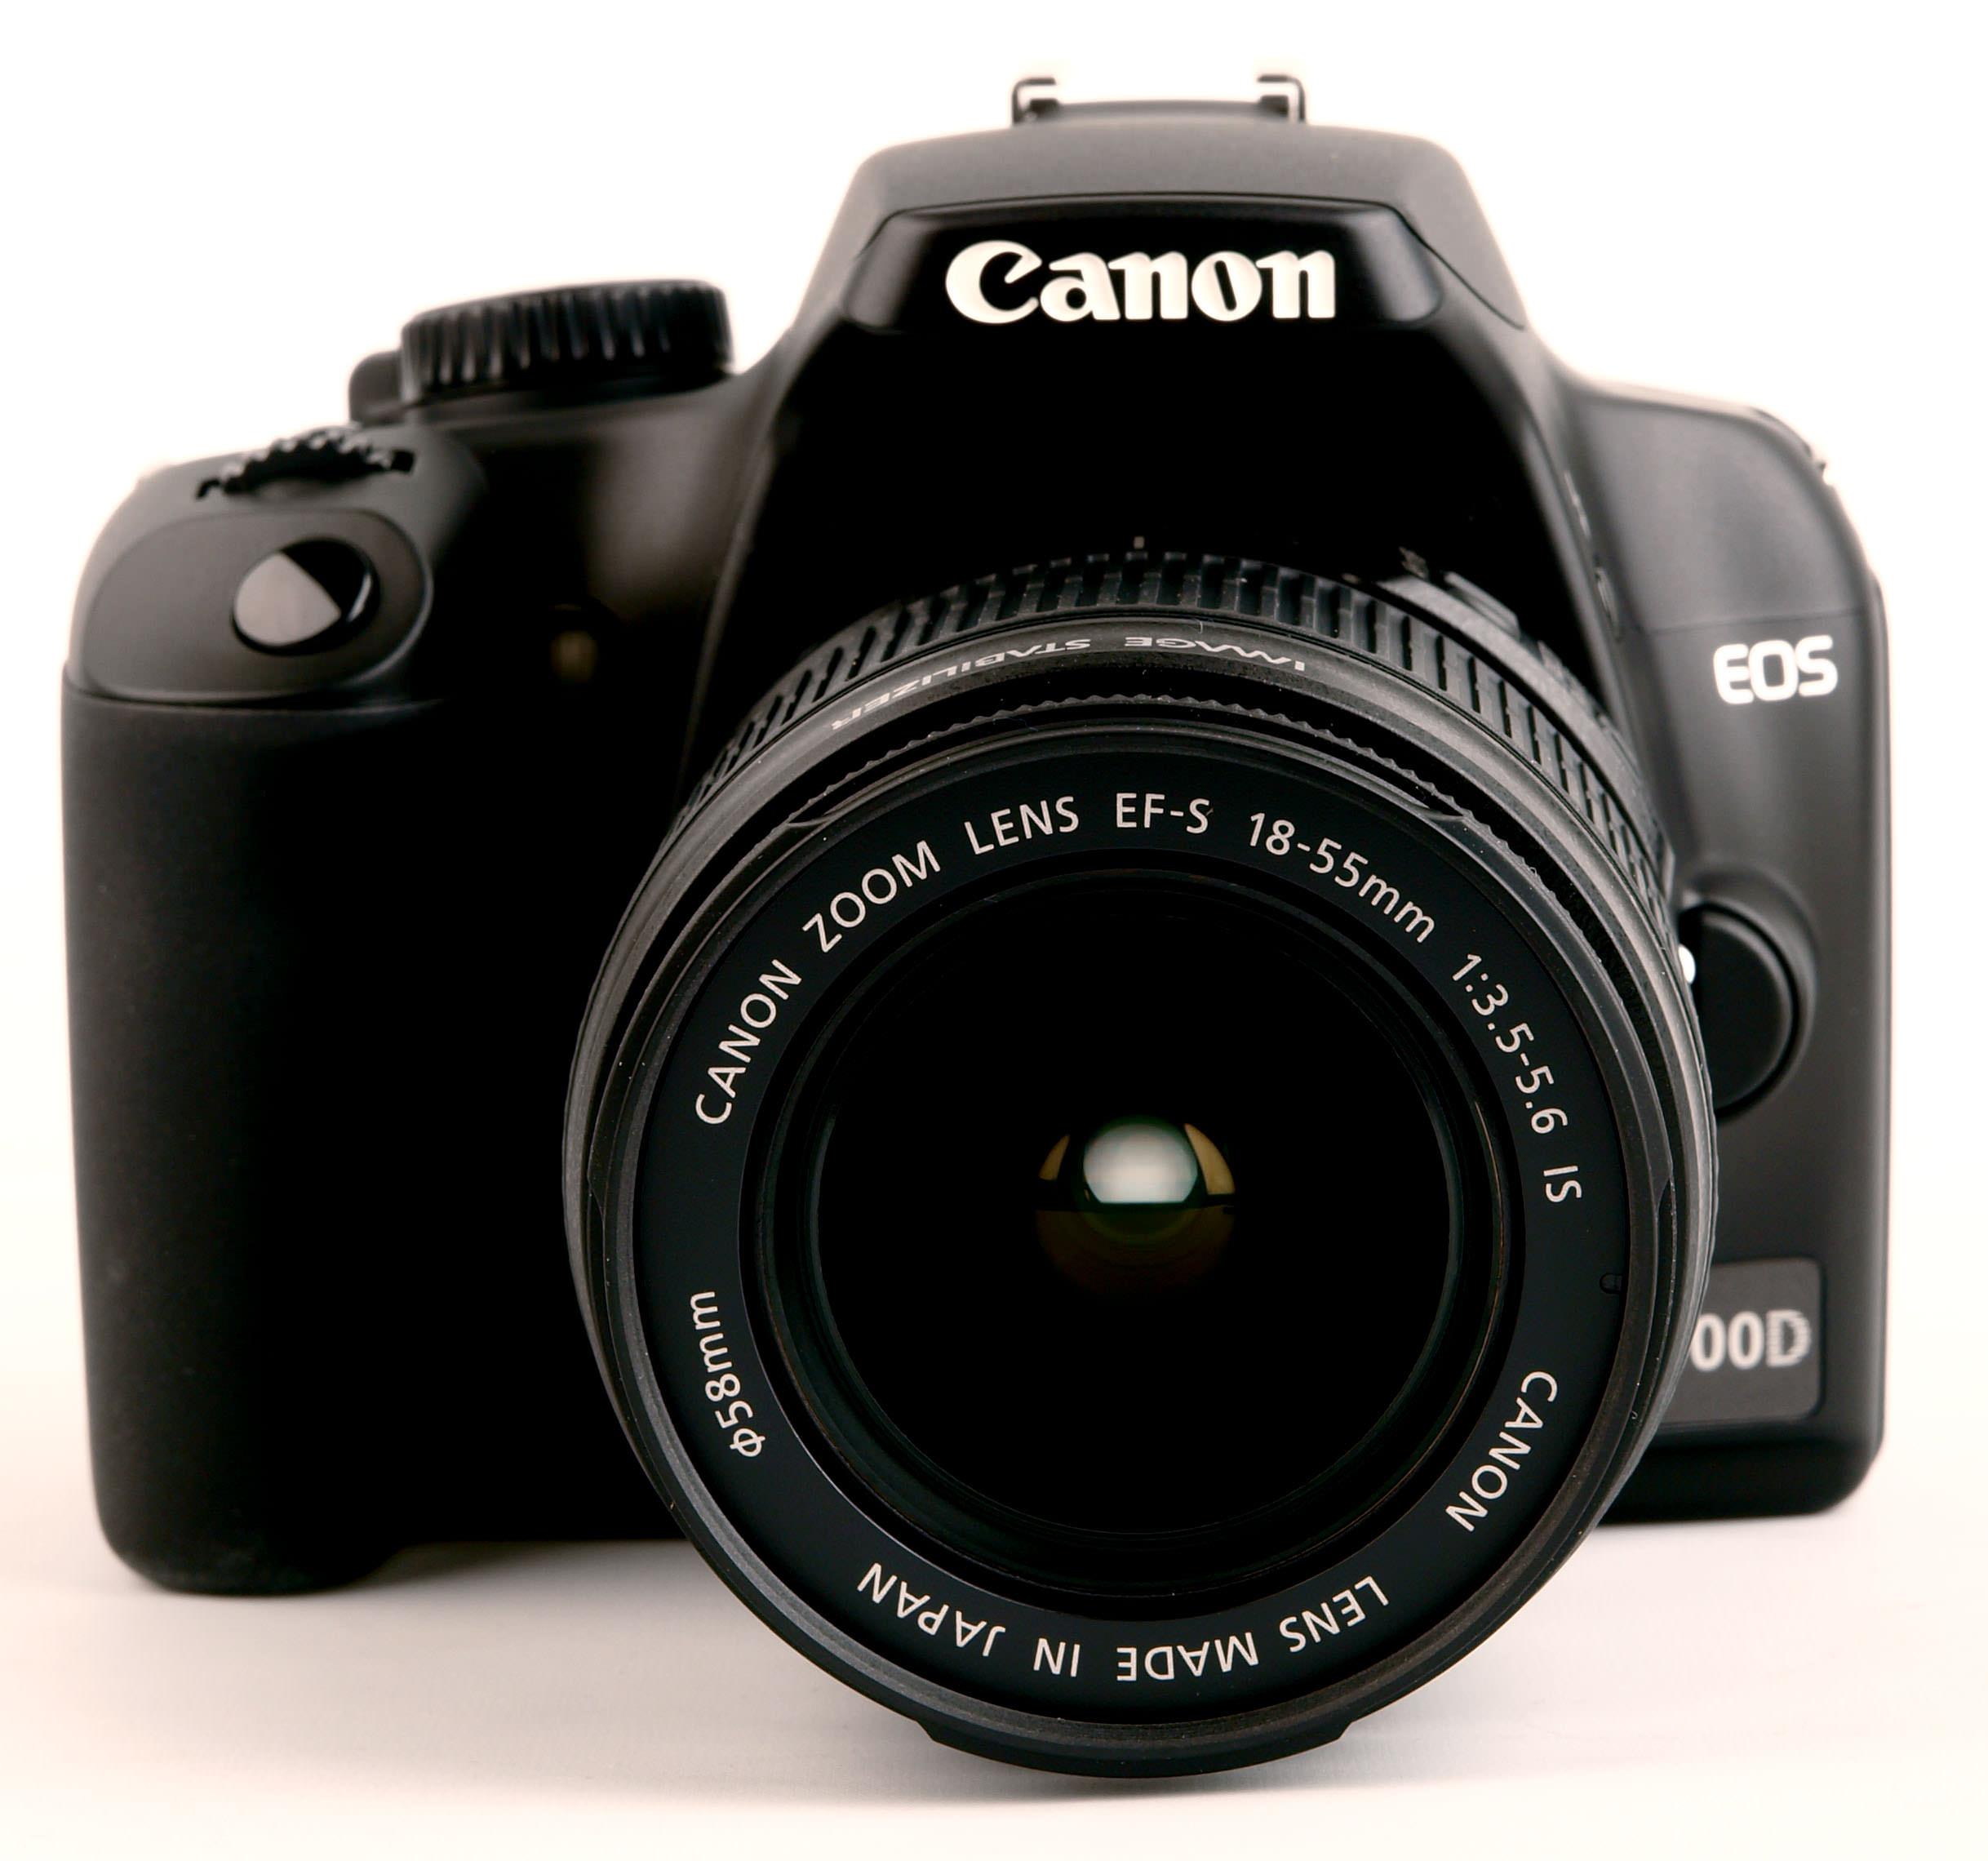 Canon EOS 1000D front view